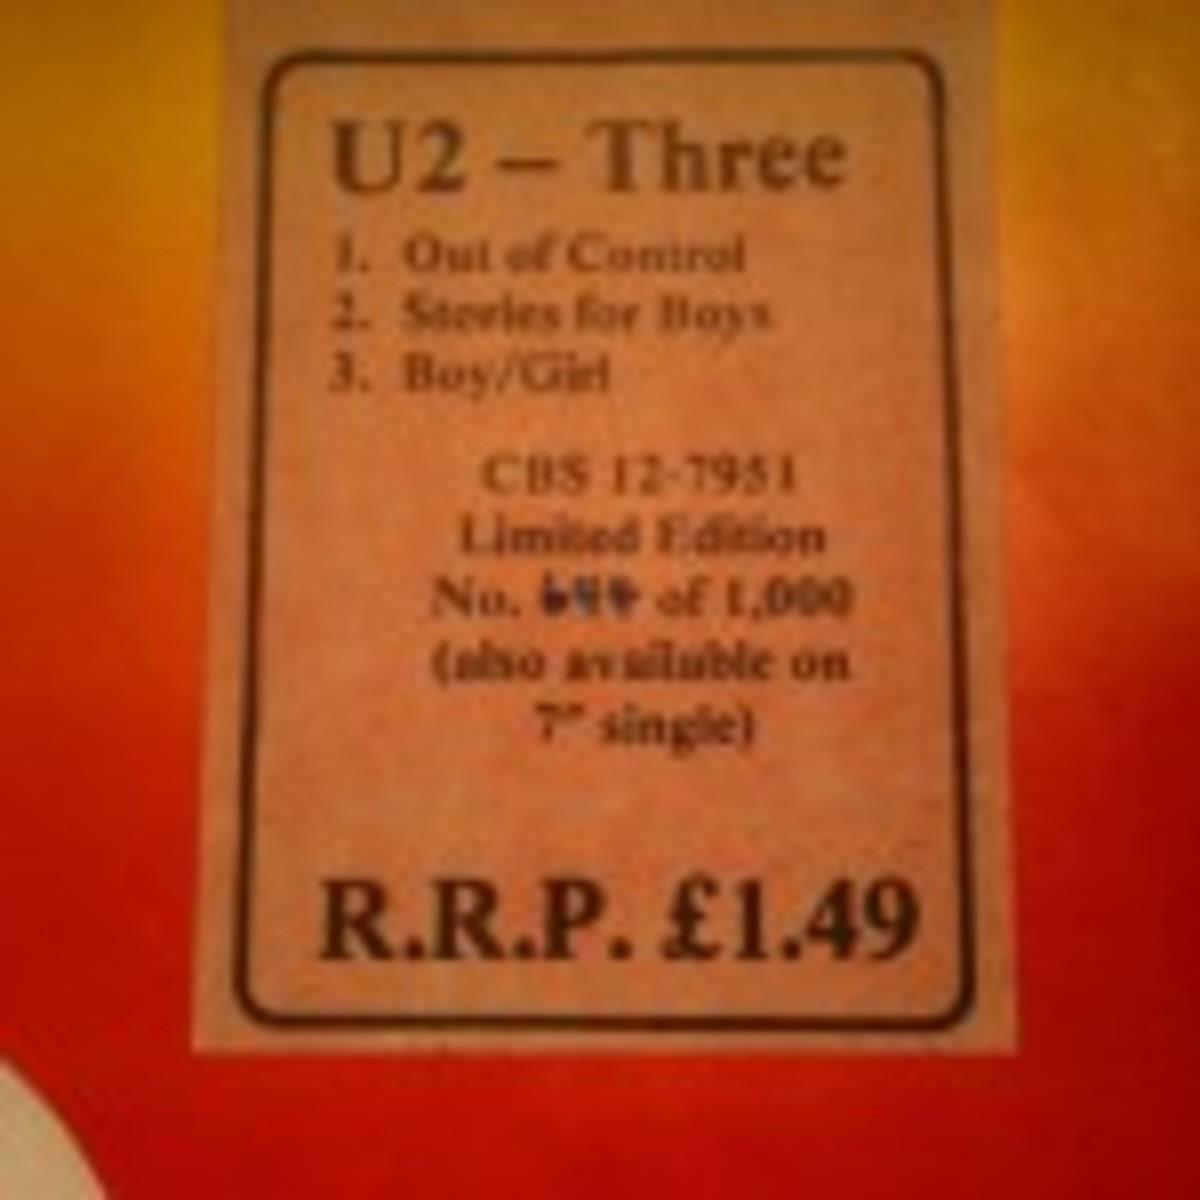 U2, Three 12-inch EP